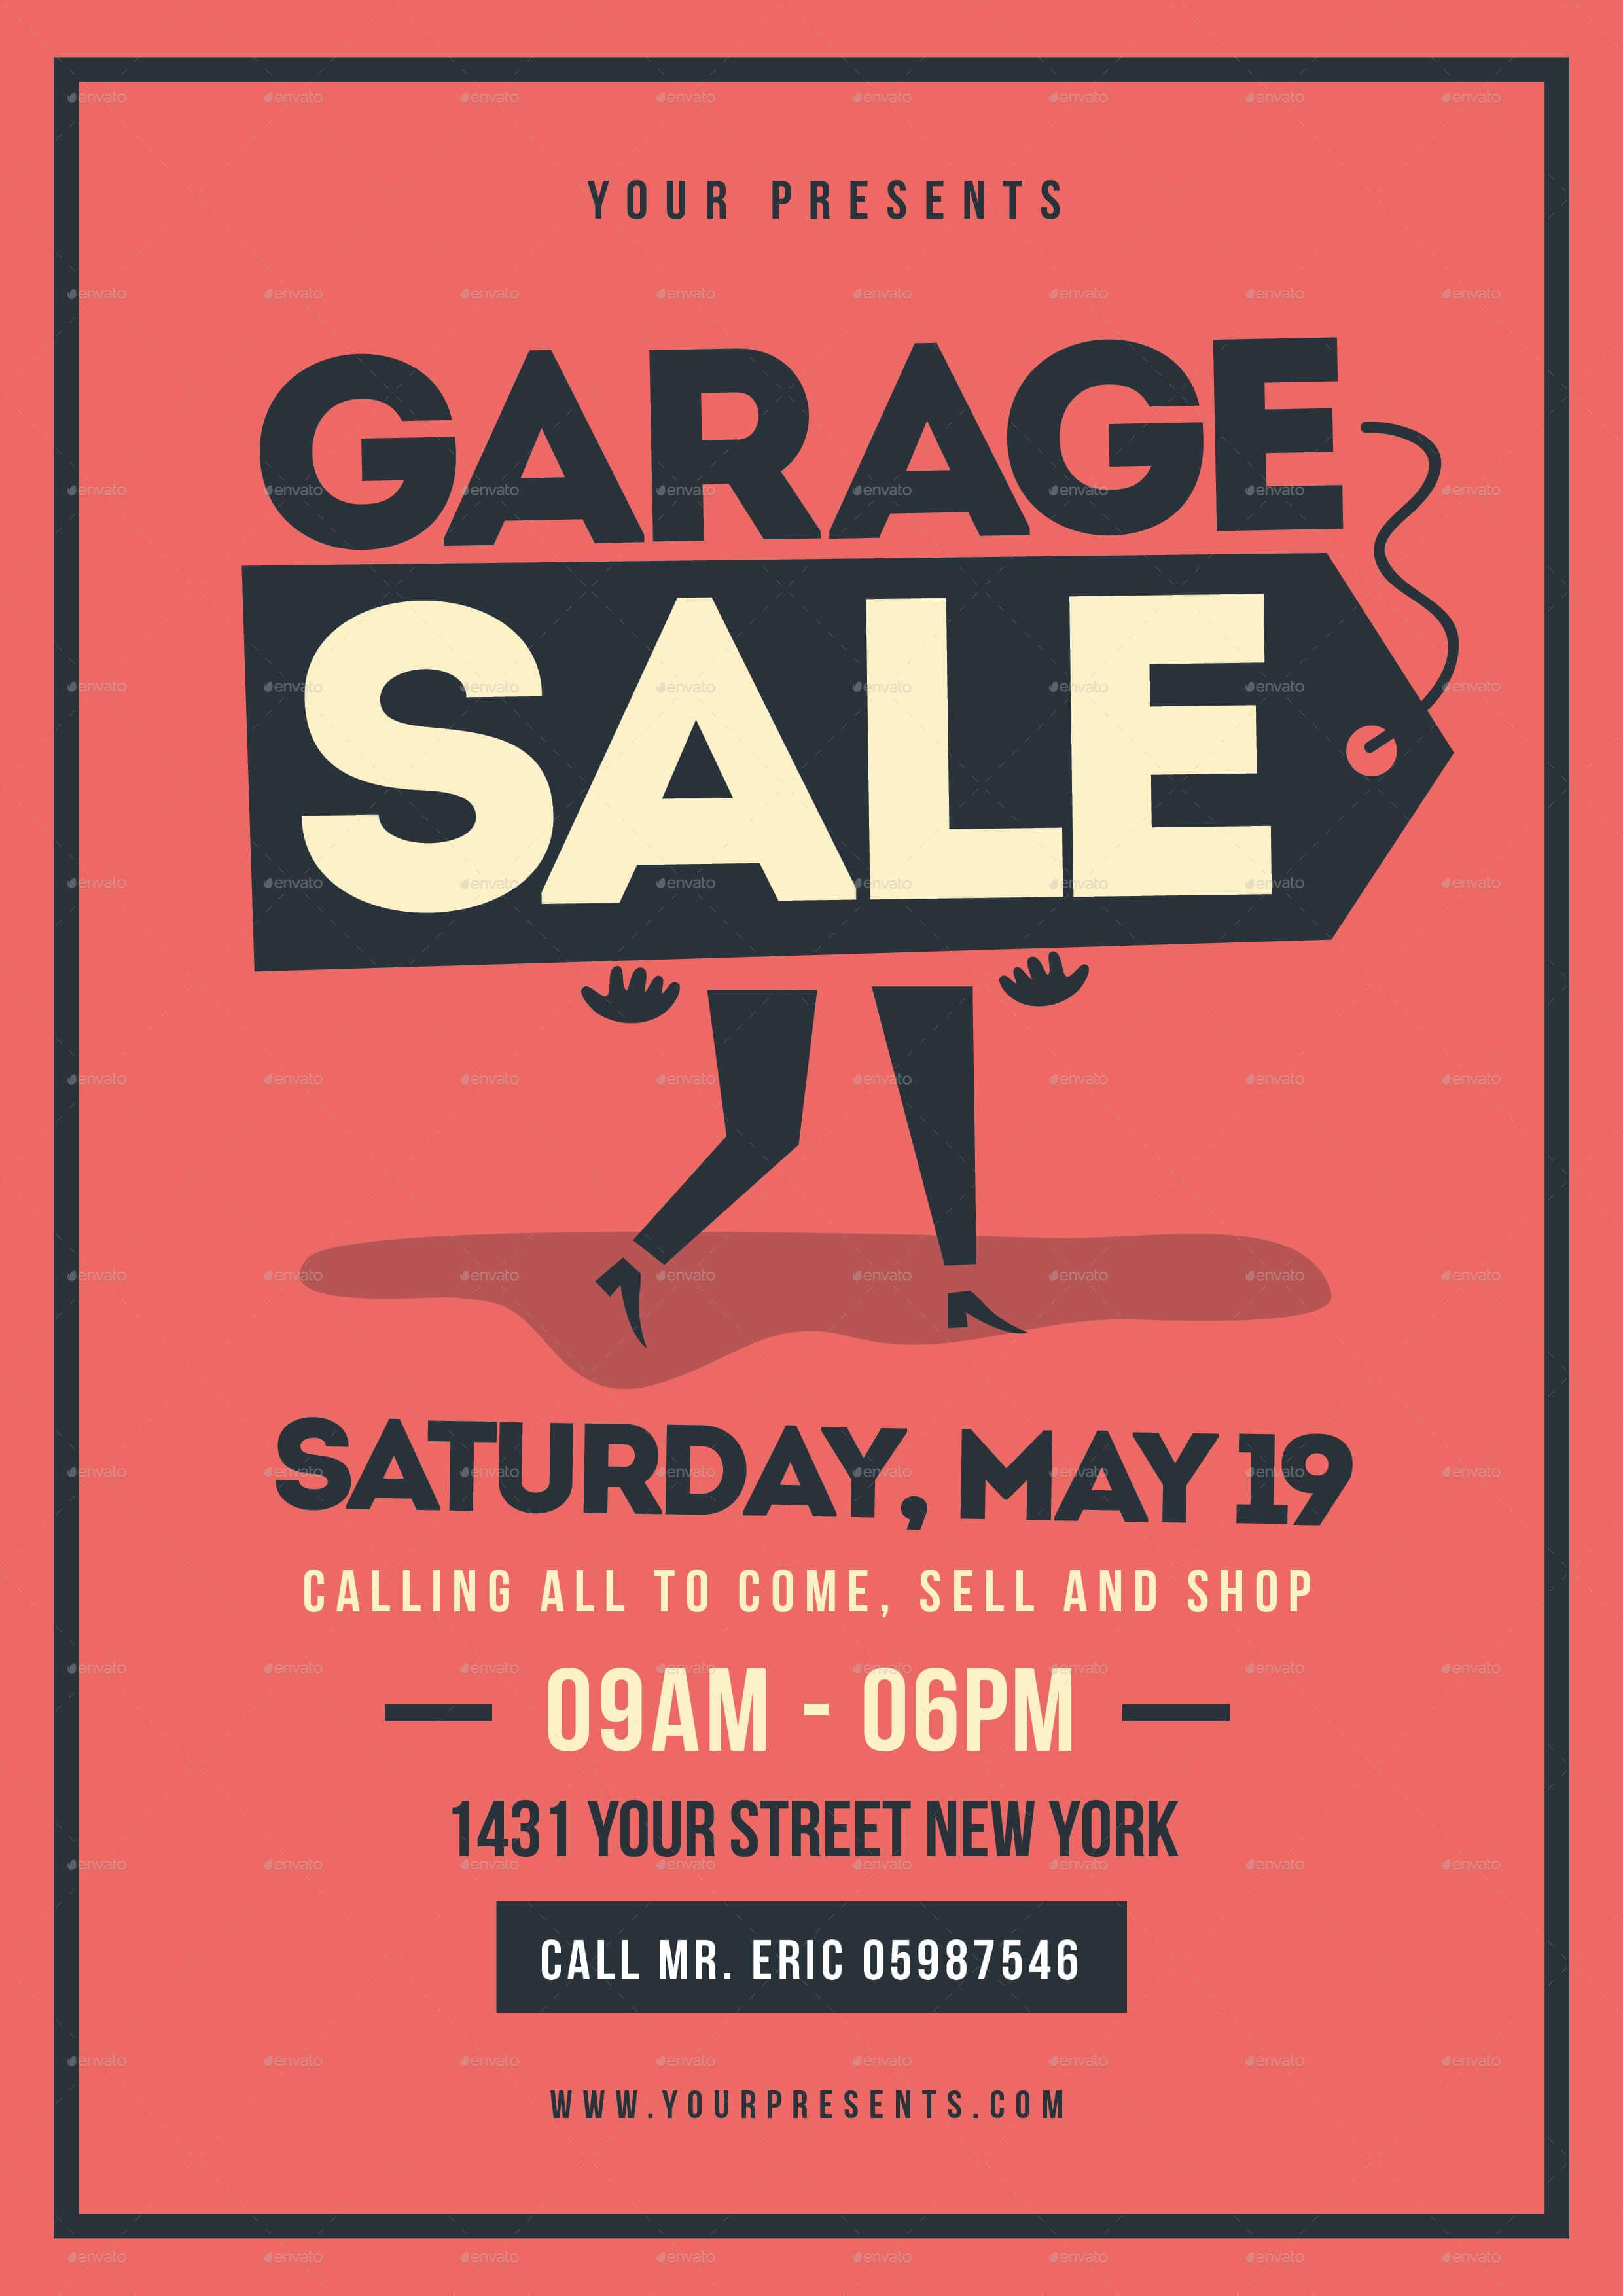 Retro Garage Sale Flyer Regarding Garage Sale Flyer Template Word